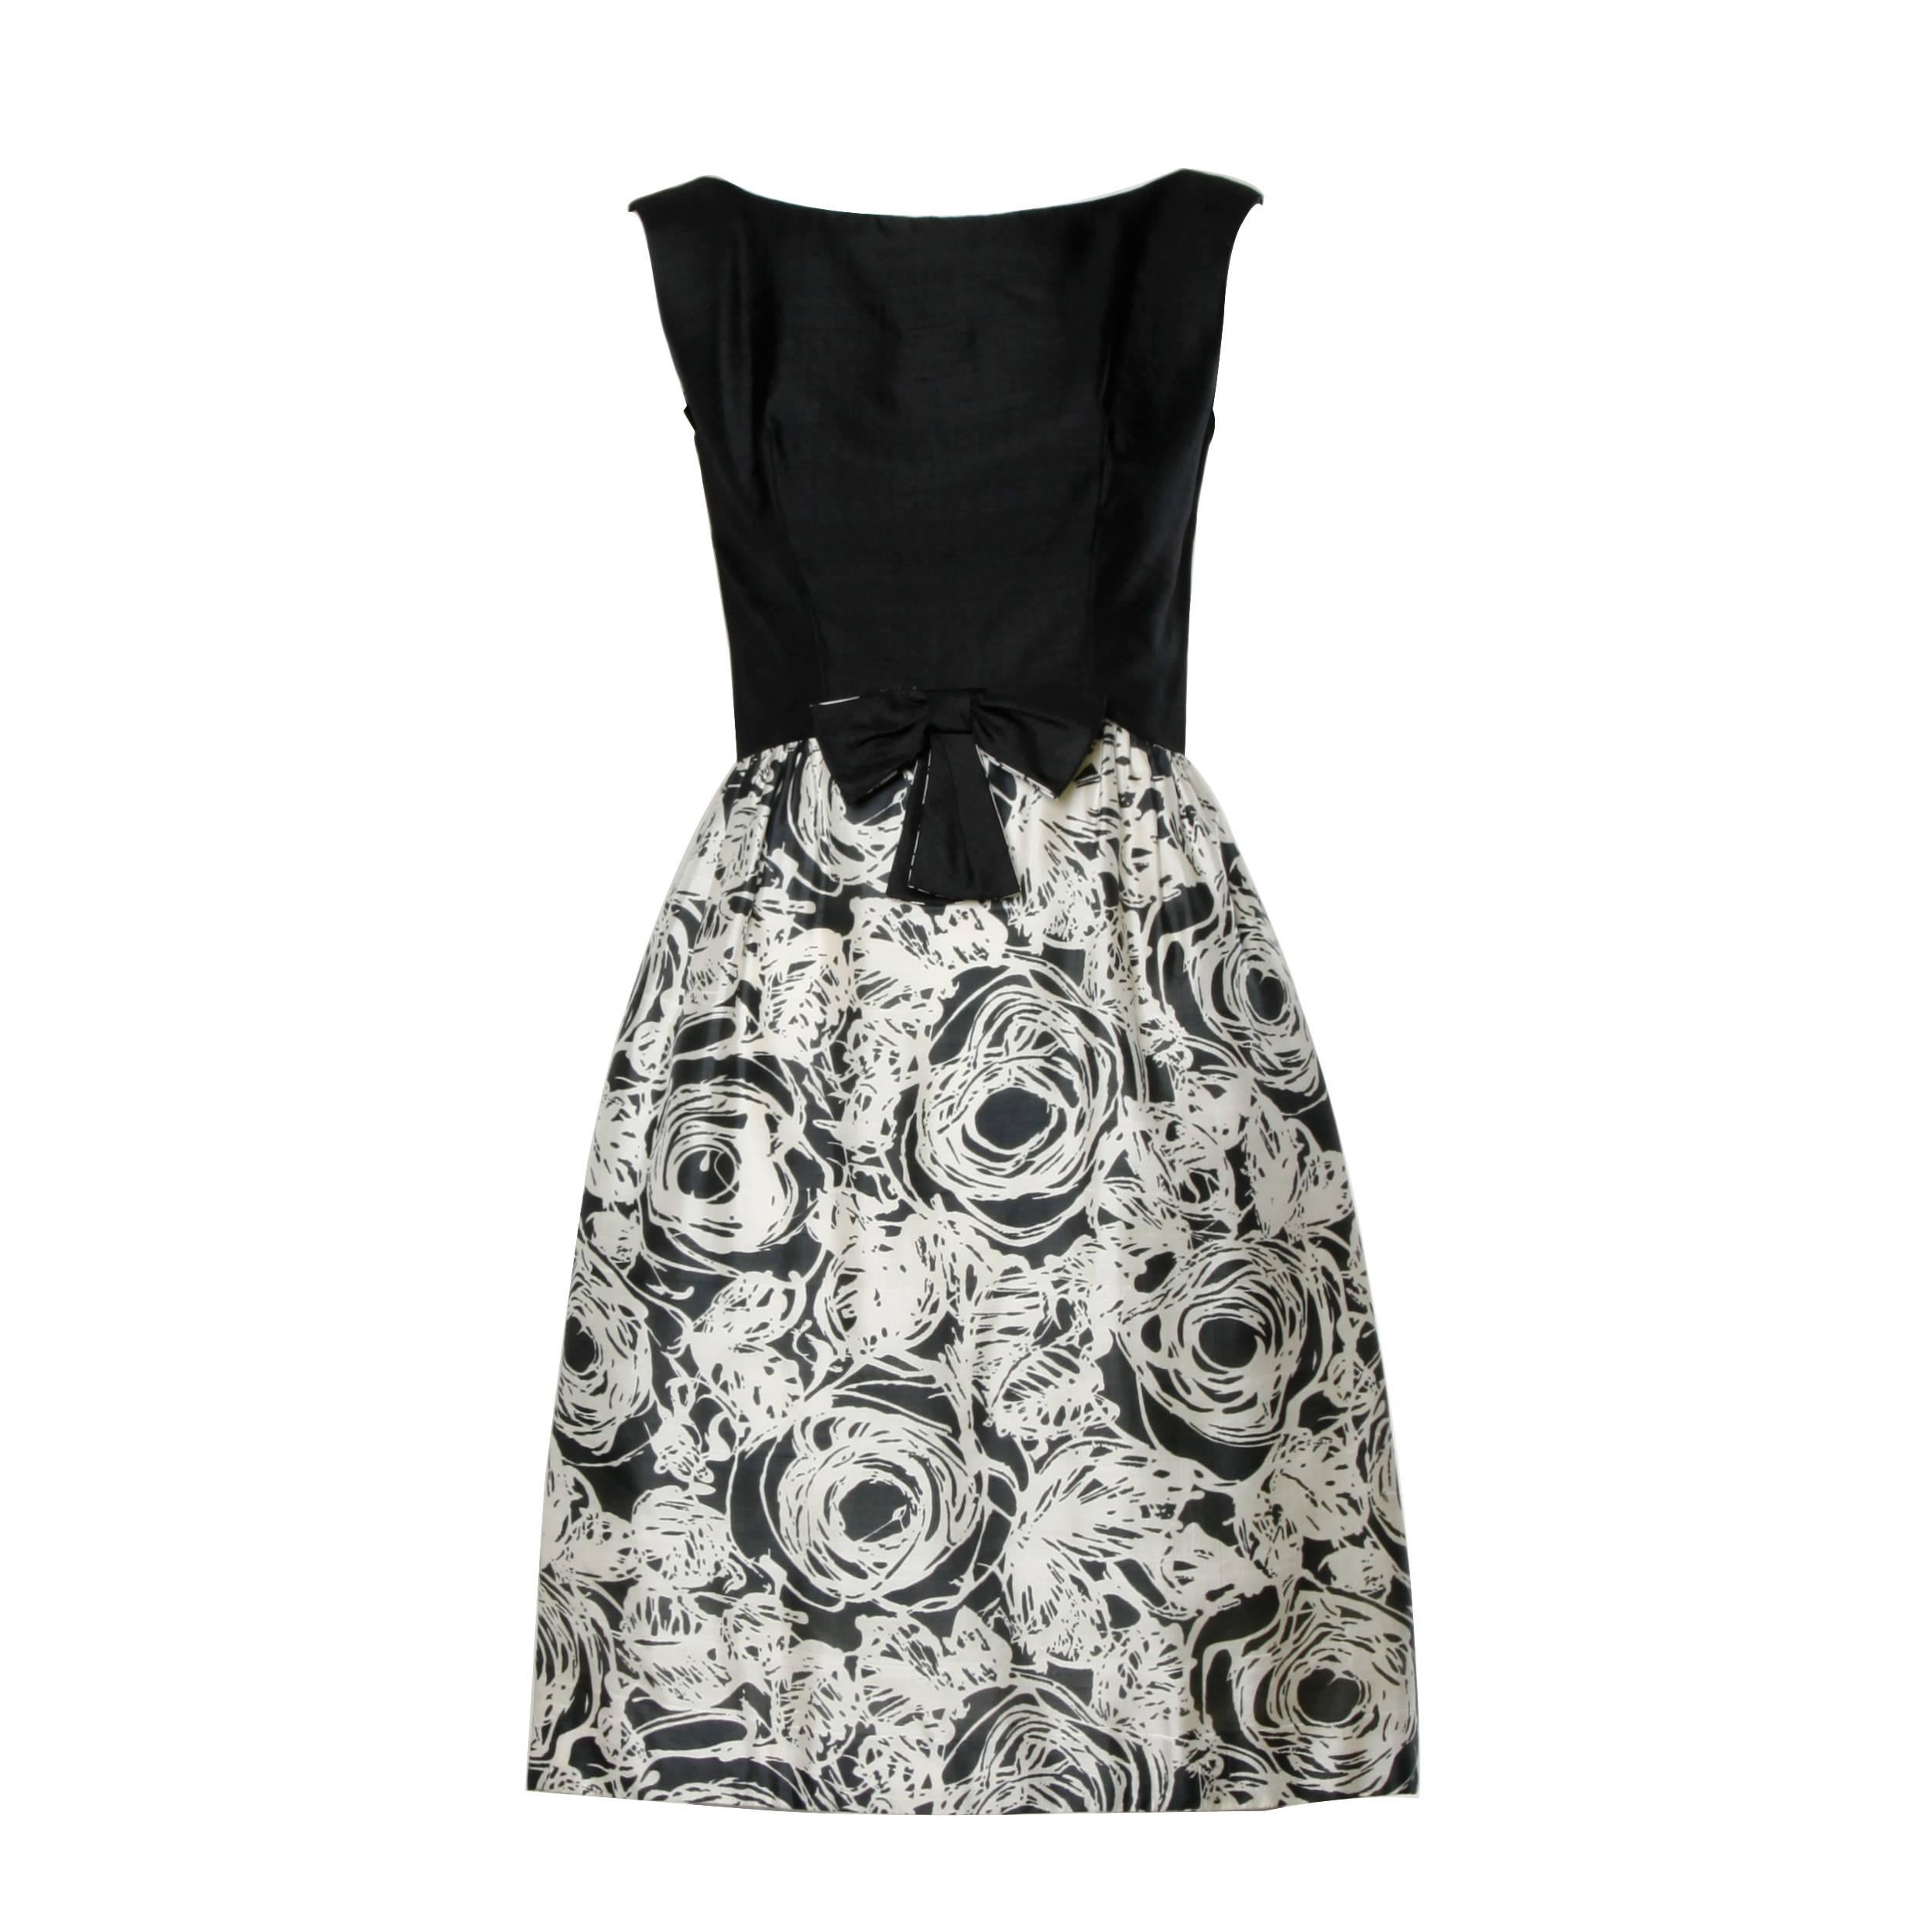 816c9d8f485c7 1920s Vintage Black Silk Chiffon Flapper Dress with Rhinestone Belt For Sale  at 1stdibs